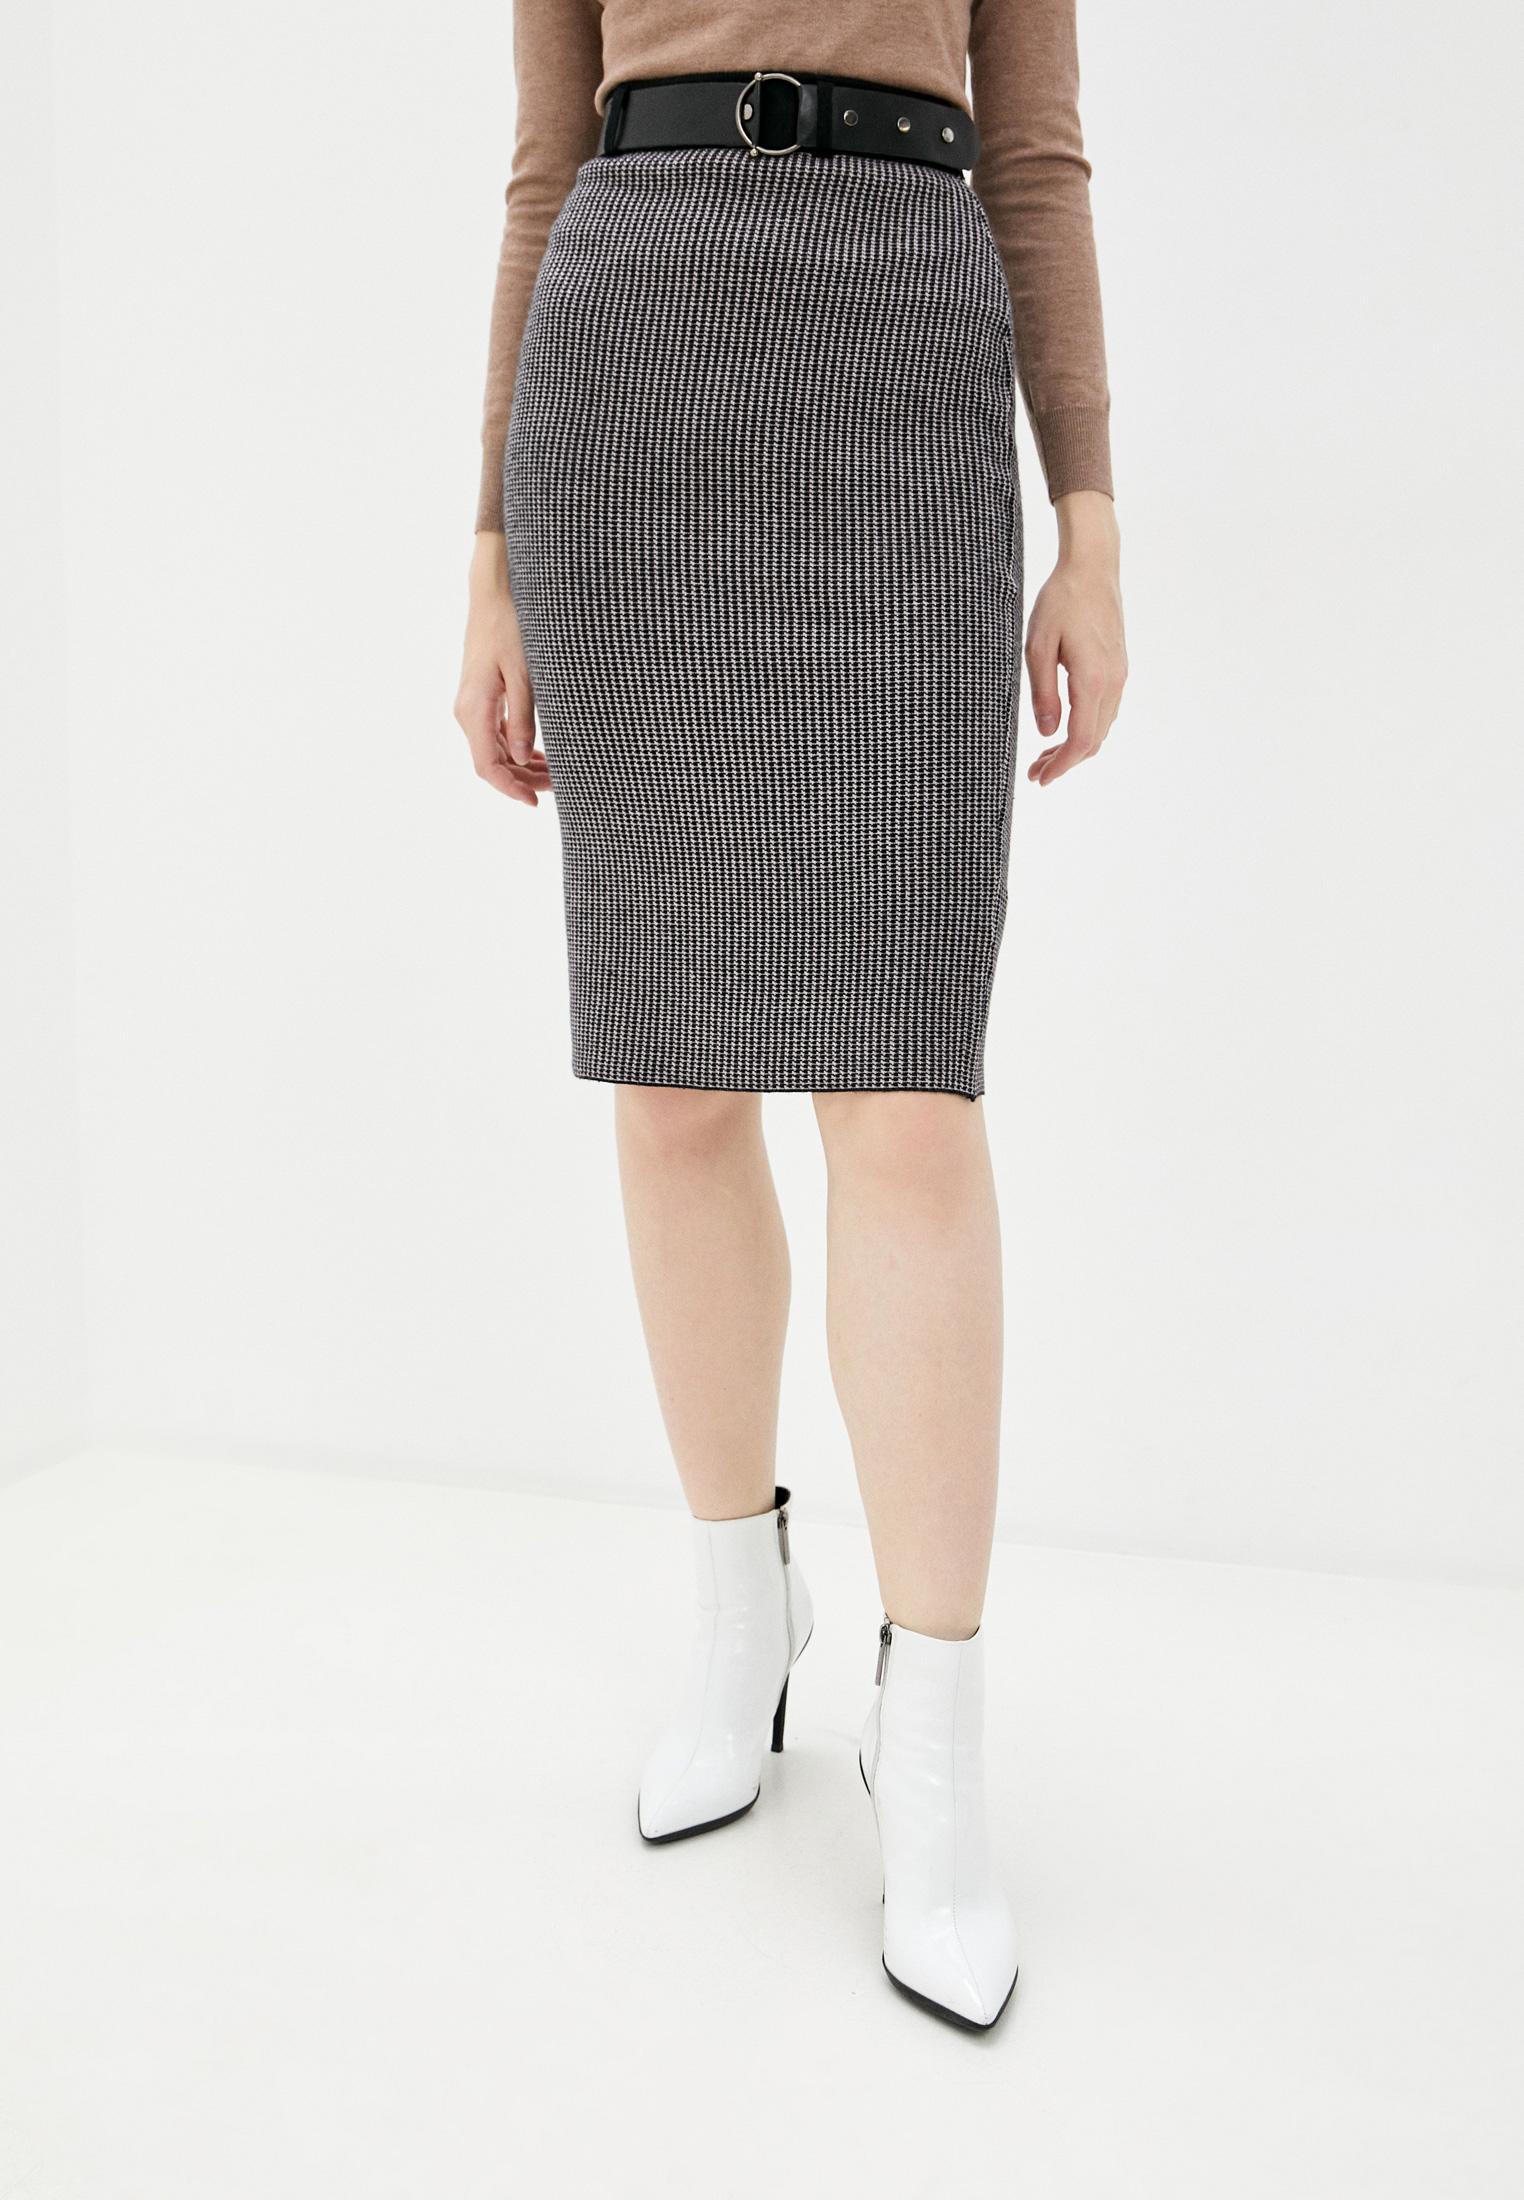 Узкая юбка Zolla Юбка Zolla